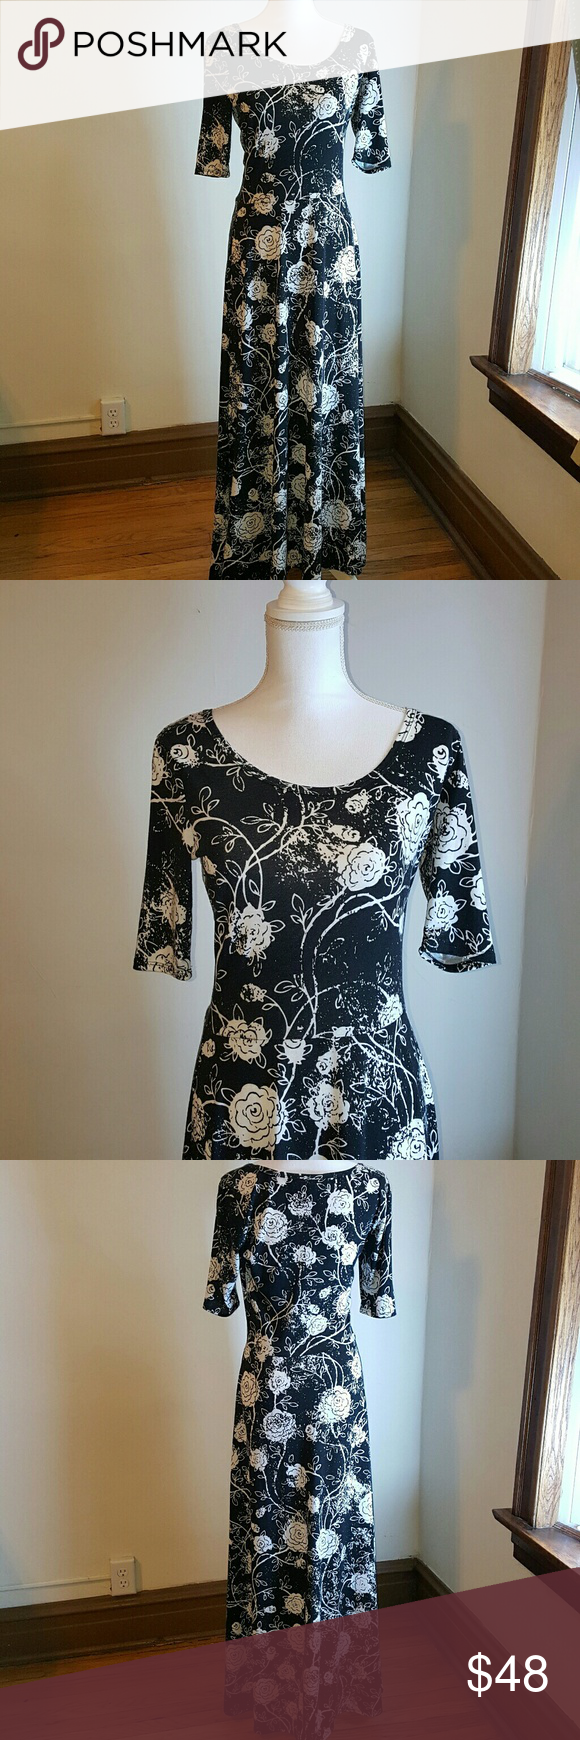 Karin Stevens Black Dress With White Flowers Dresses Clothes Design Womens Dresses [ 1740 x 580 Pixel ]